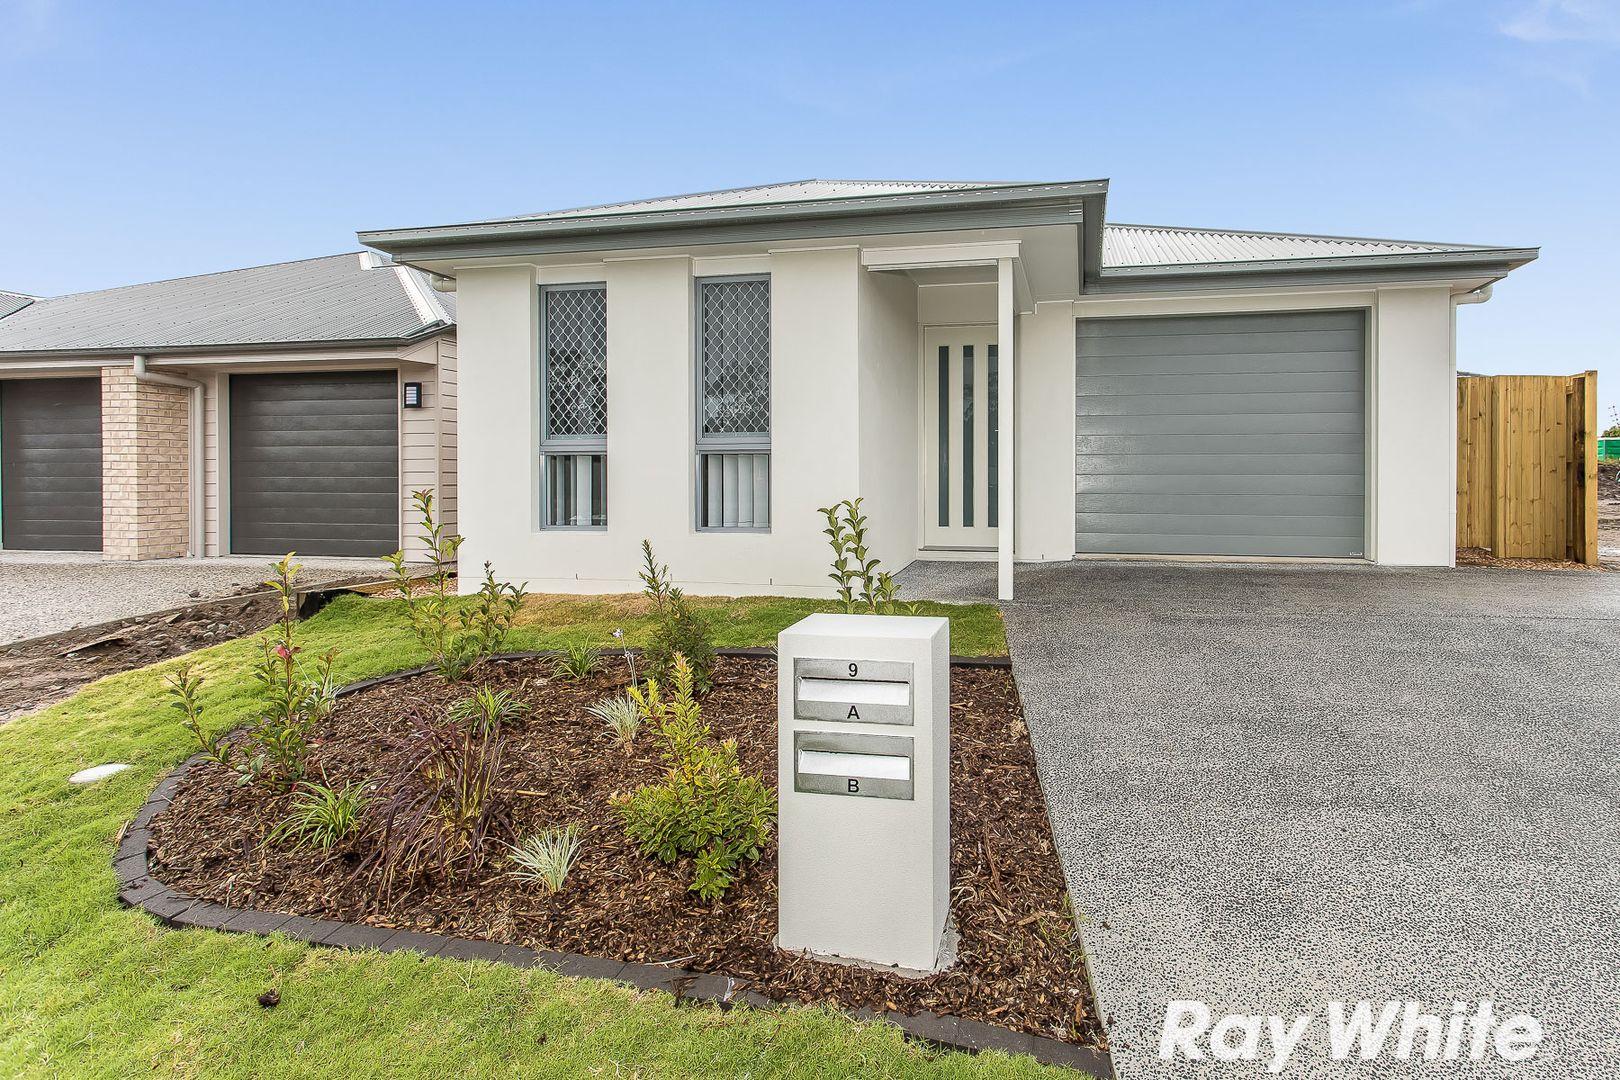 New Road, Morayfield QLD 4506, Image 0